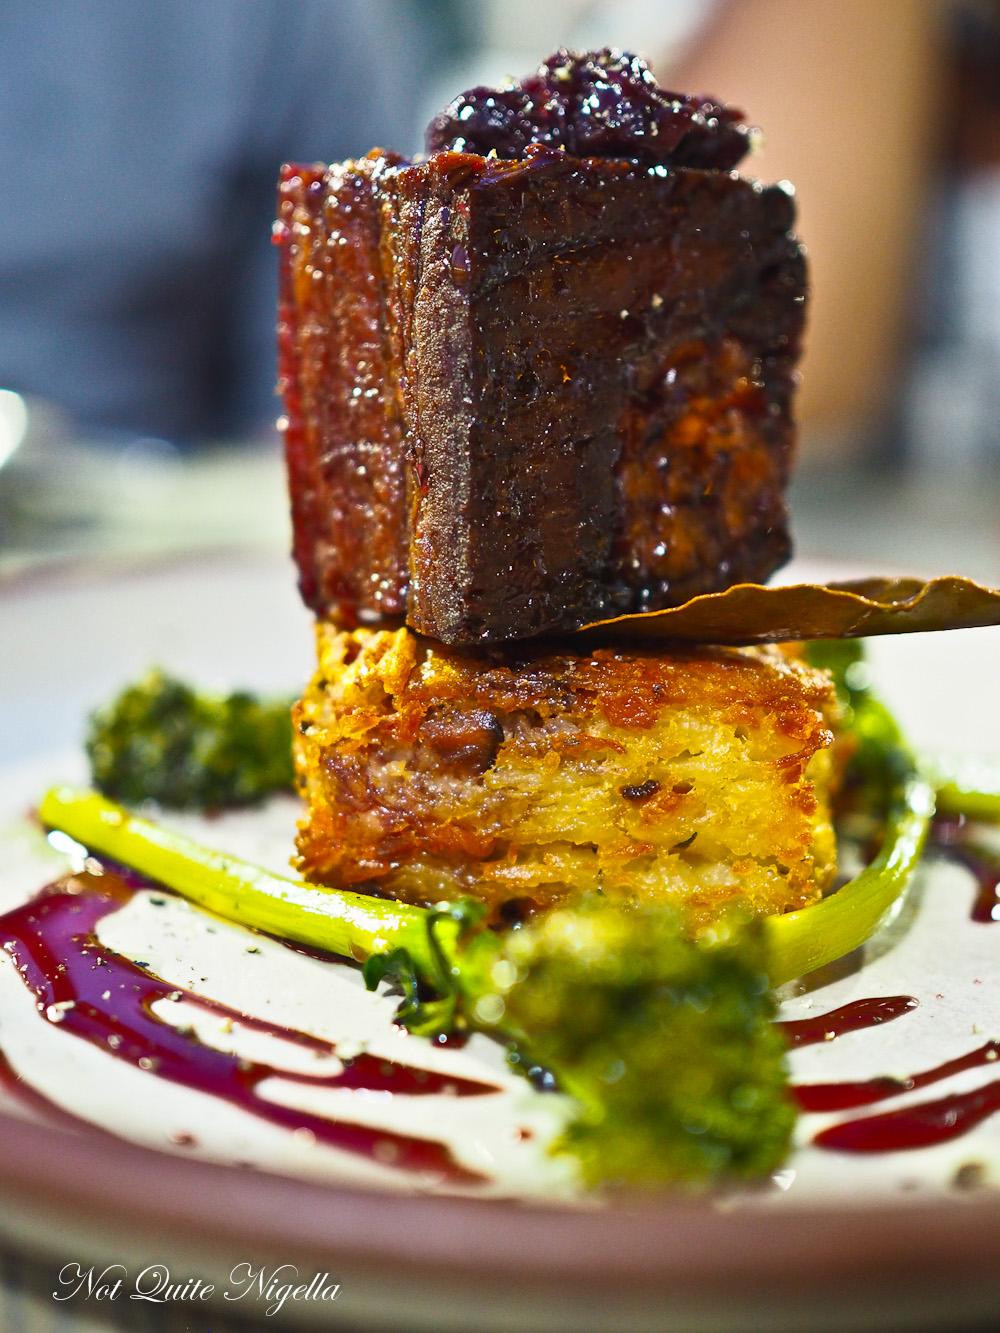 Bacon Festival Sydney Cuckoo Callay